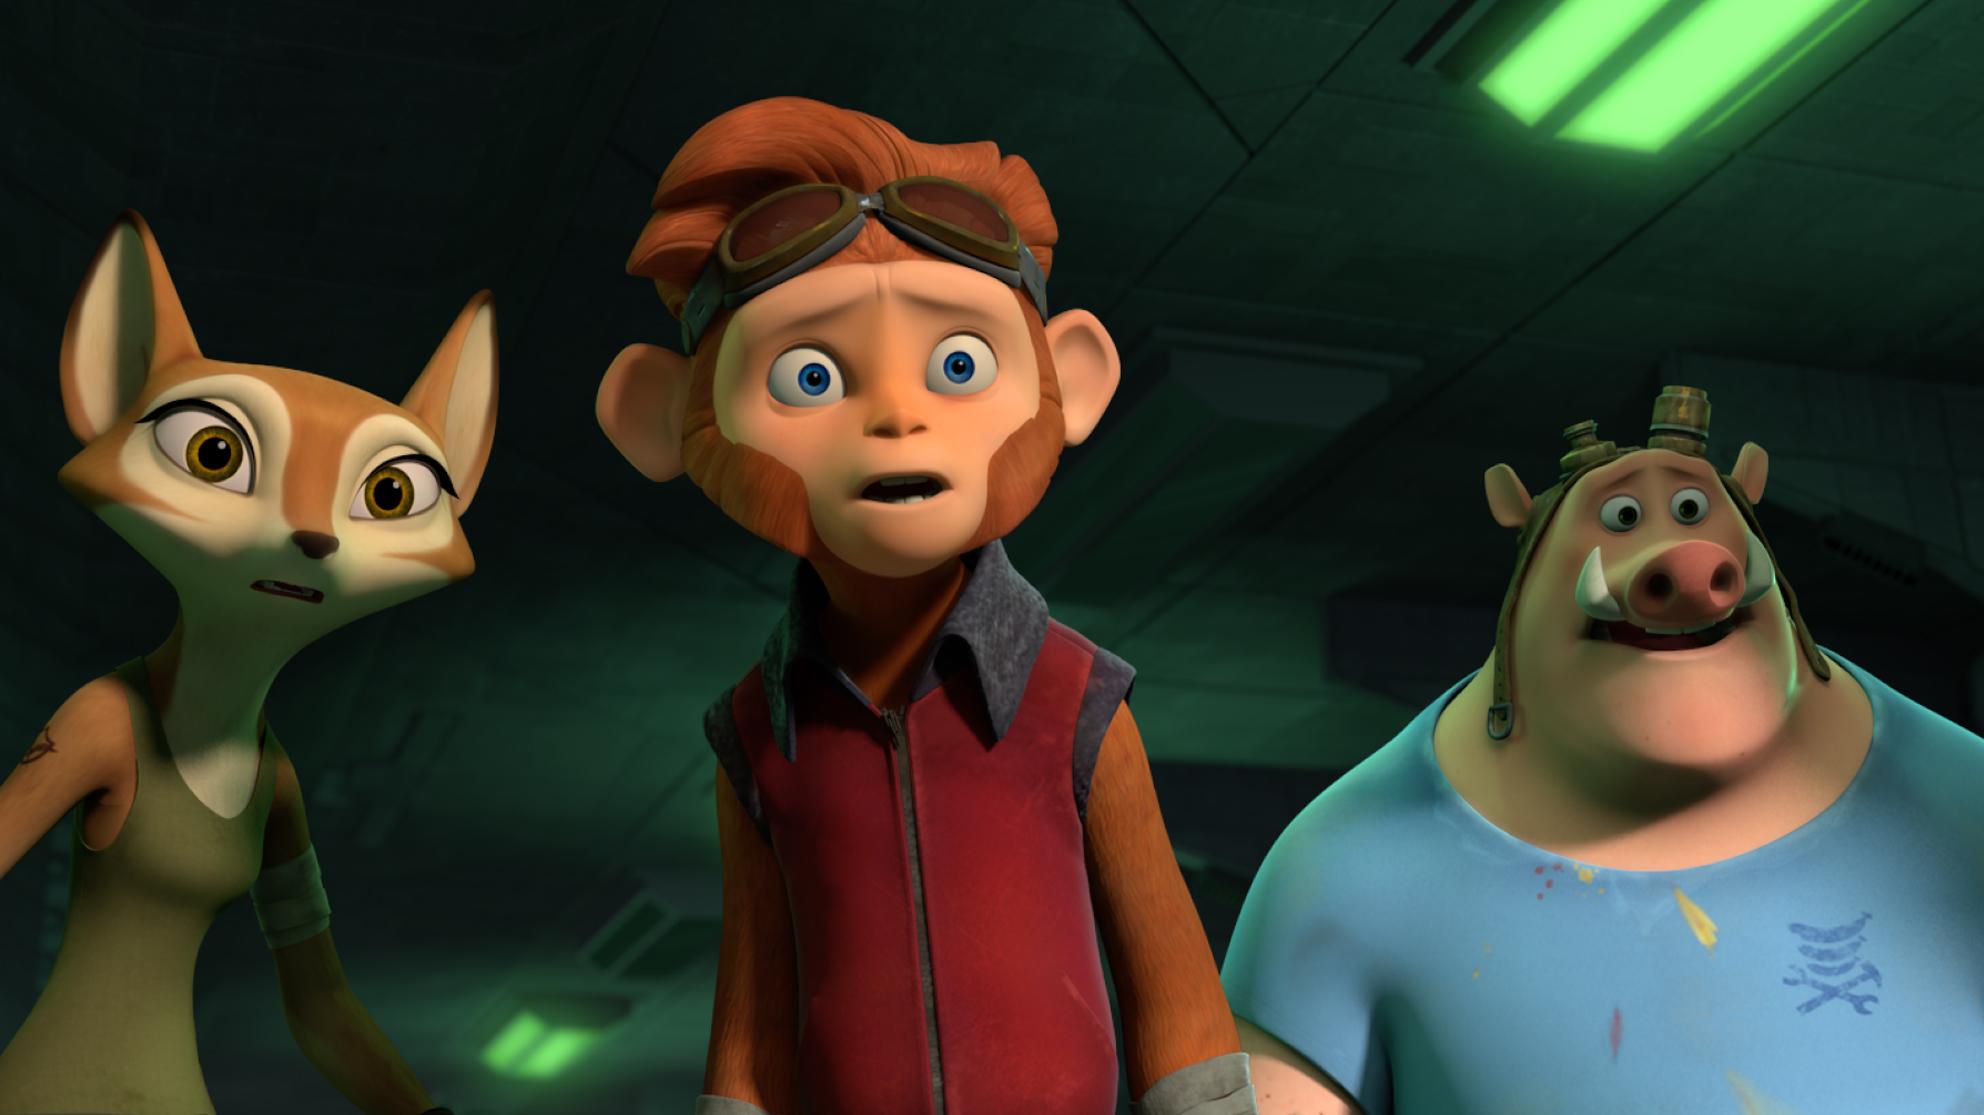 All About Disney #2 Pinocchio | Disney Amino